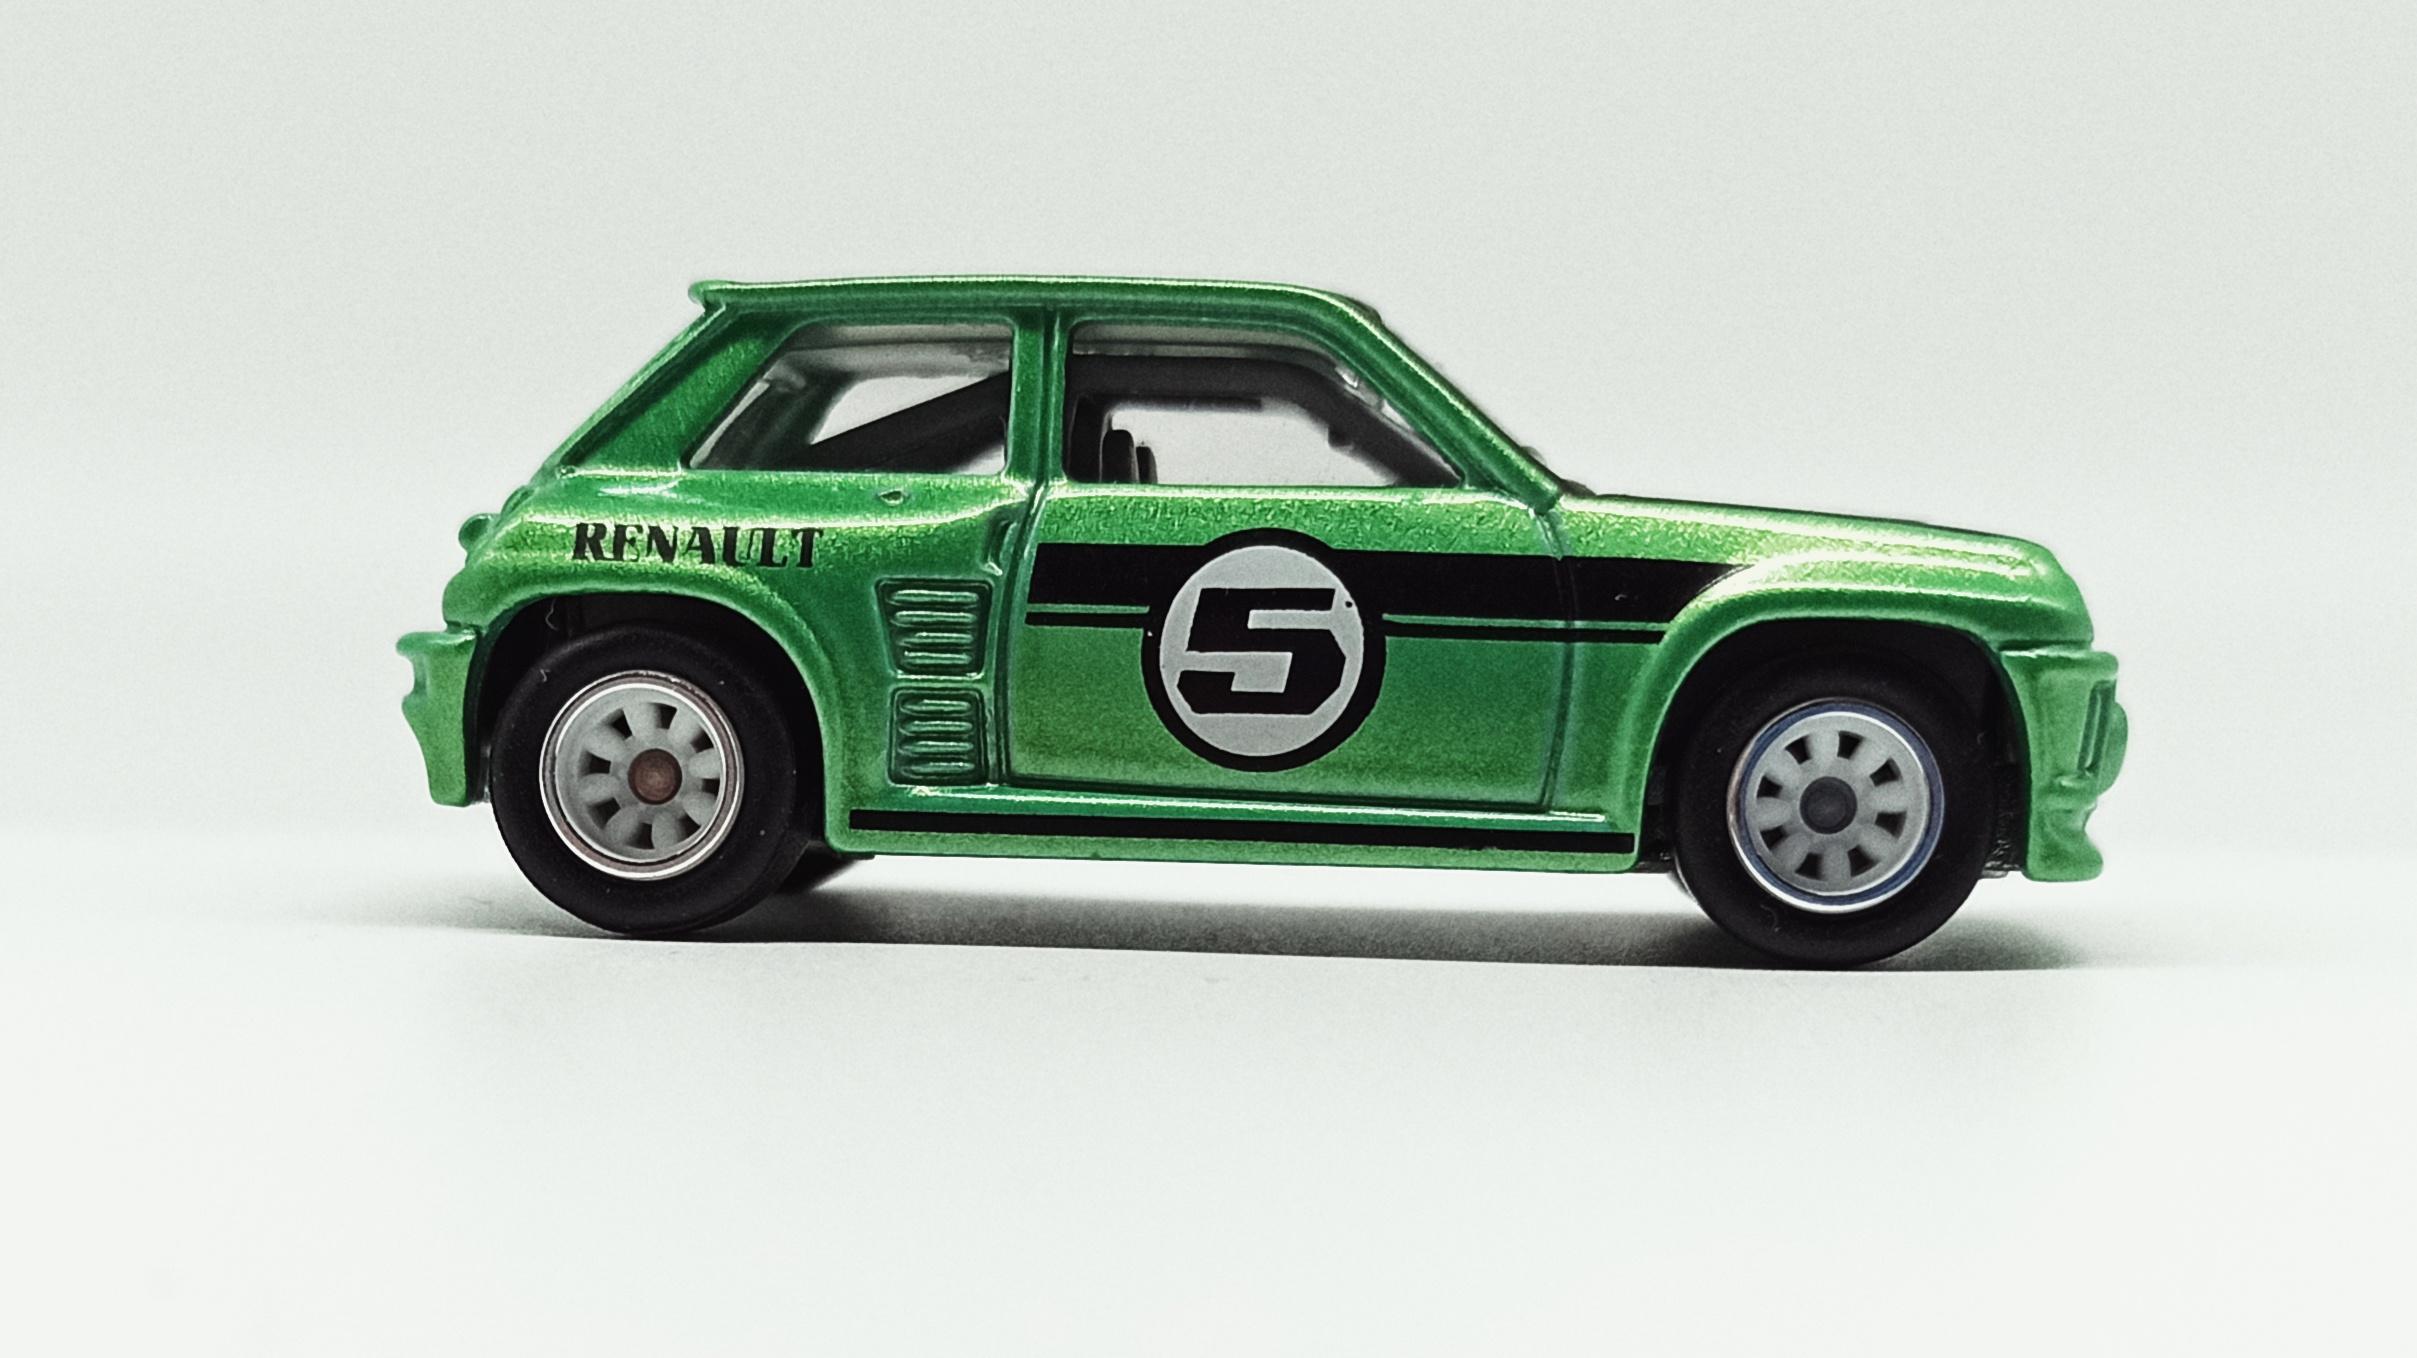 Hot Wheels Renault 5 Turbo (X8244) 2013 Boulevard metalflake green side